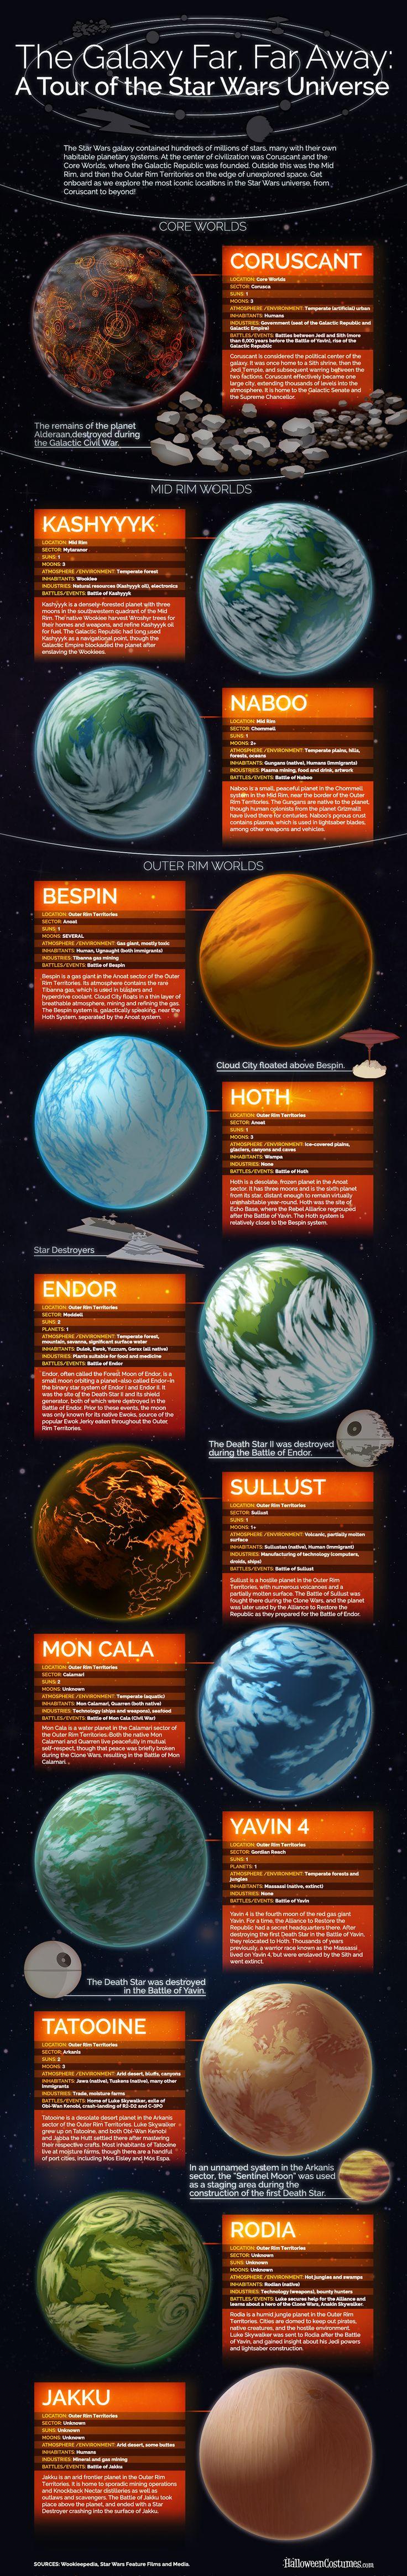 The Galaxy Far, Far Away: A Tour of the Star Wars Universe…